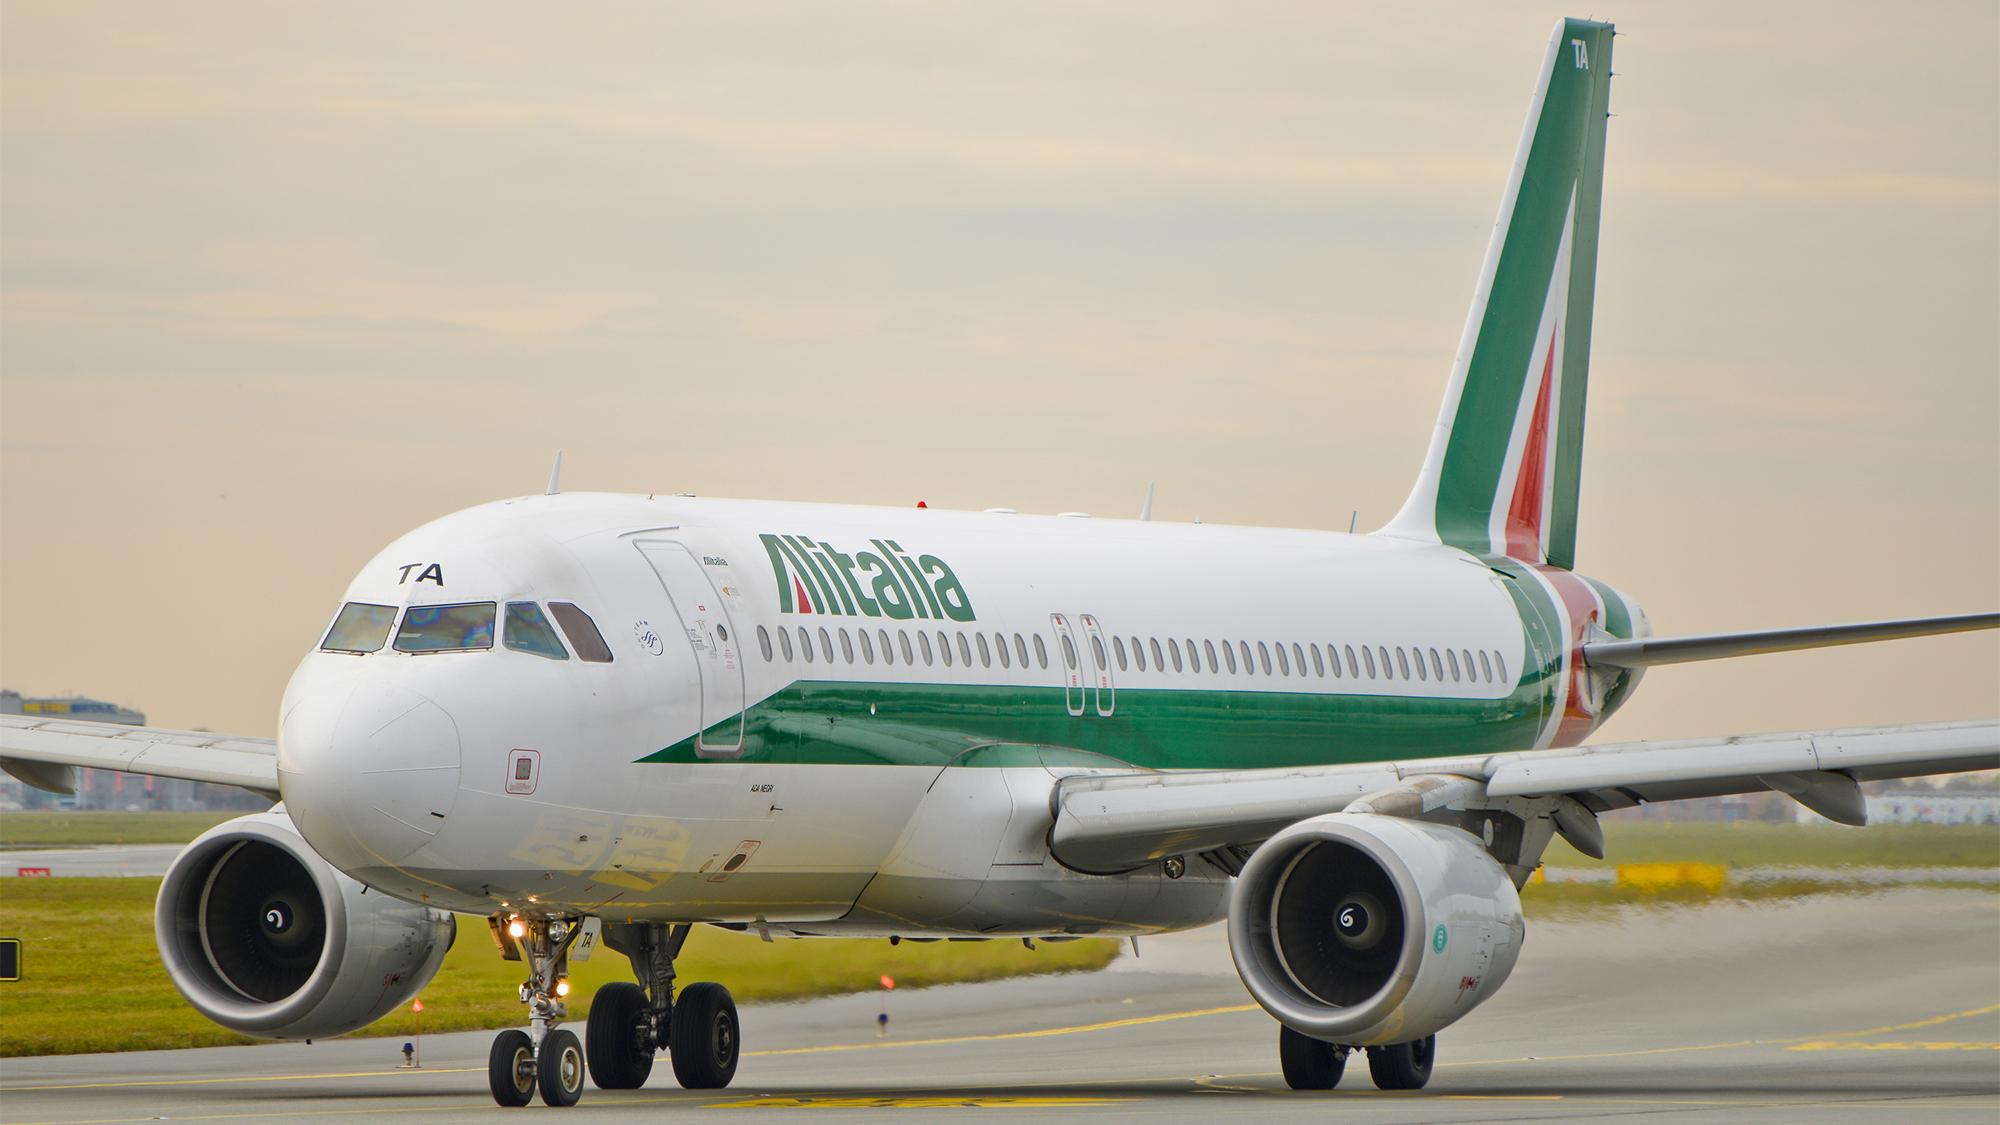 Alitalia pledges return to profit by end-2019 through heavy cuts